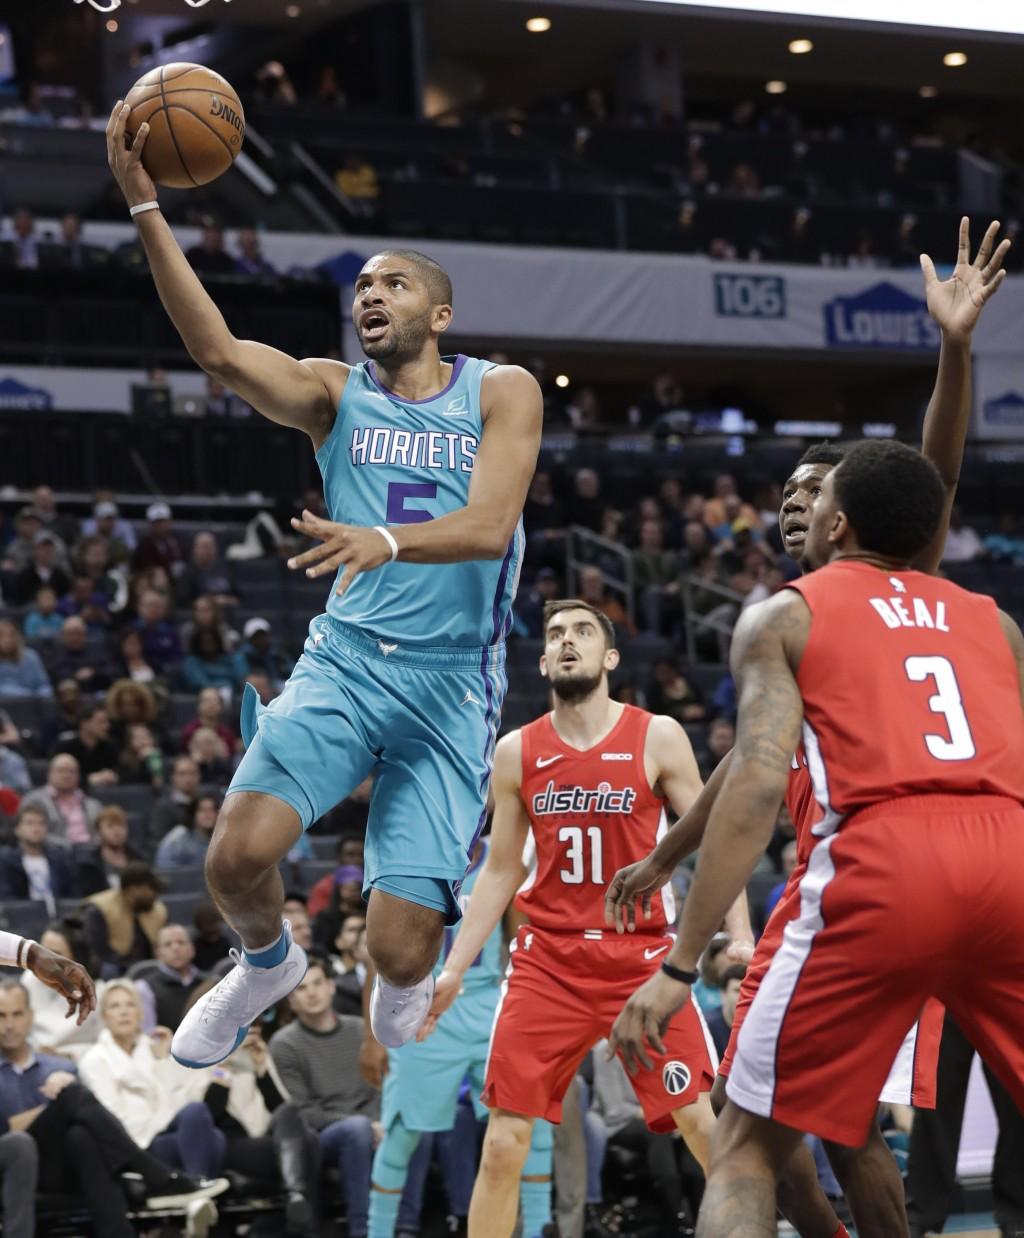 Charlotte Hornets forward Nicolas Batum (5) drives past Washington Wizards guard Bradley Beal (3) and Washington Wizards guard Tomas Satoransky (31) d...